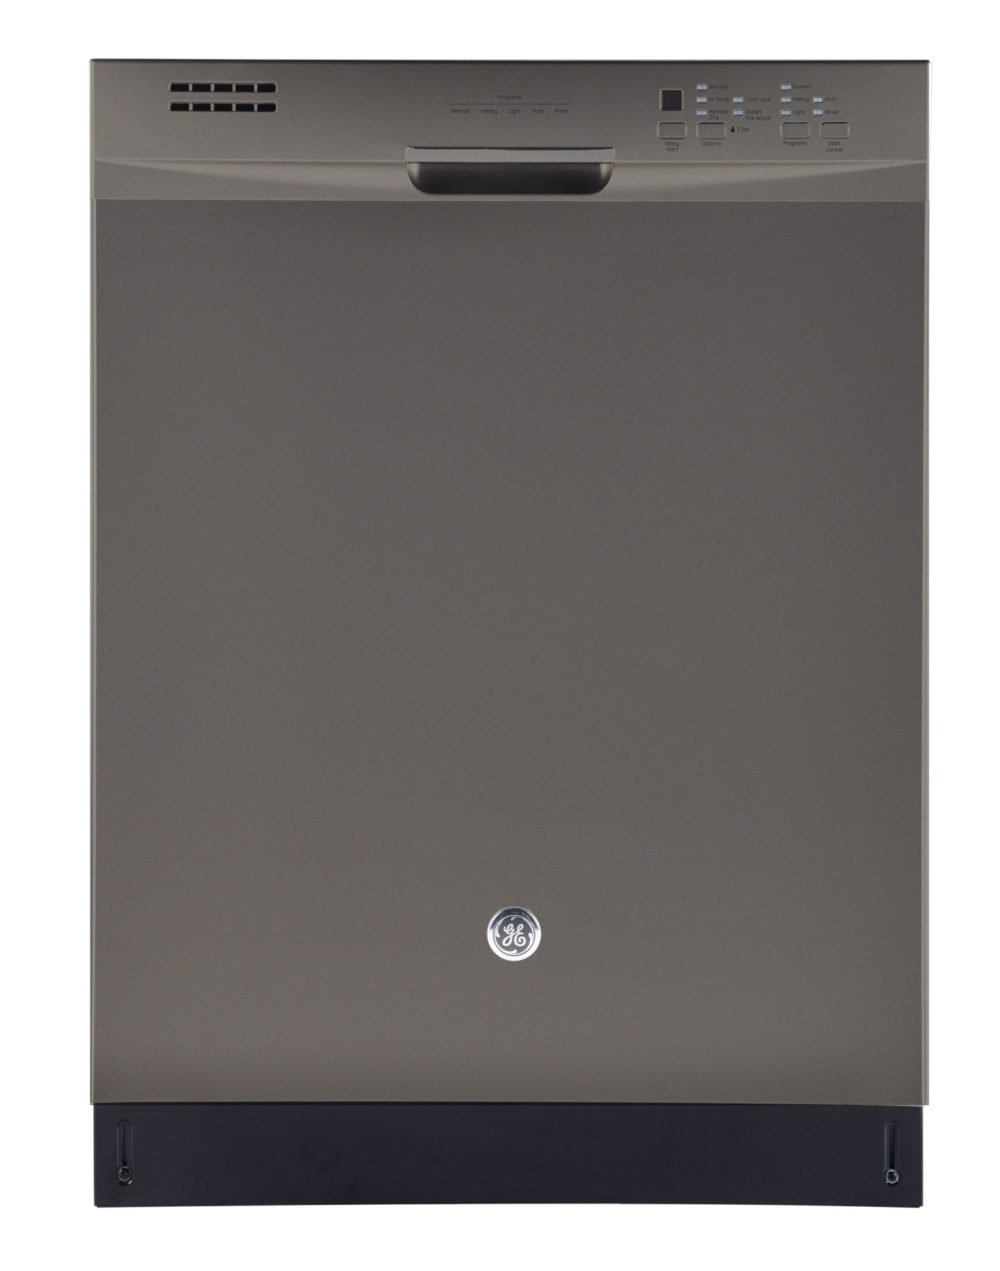 21933 - Dishwasher - GBF630SMLES